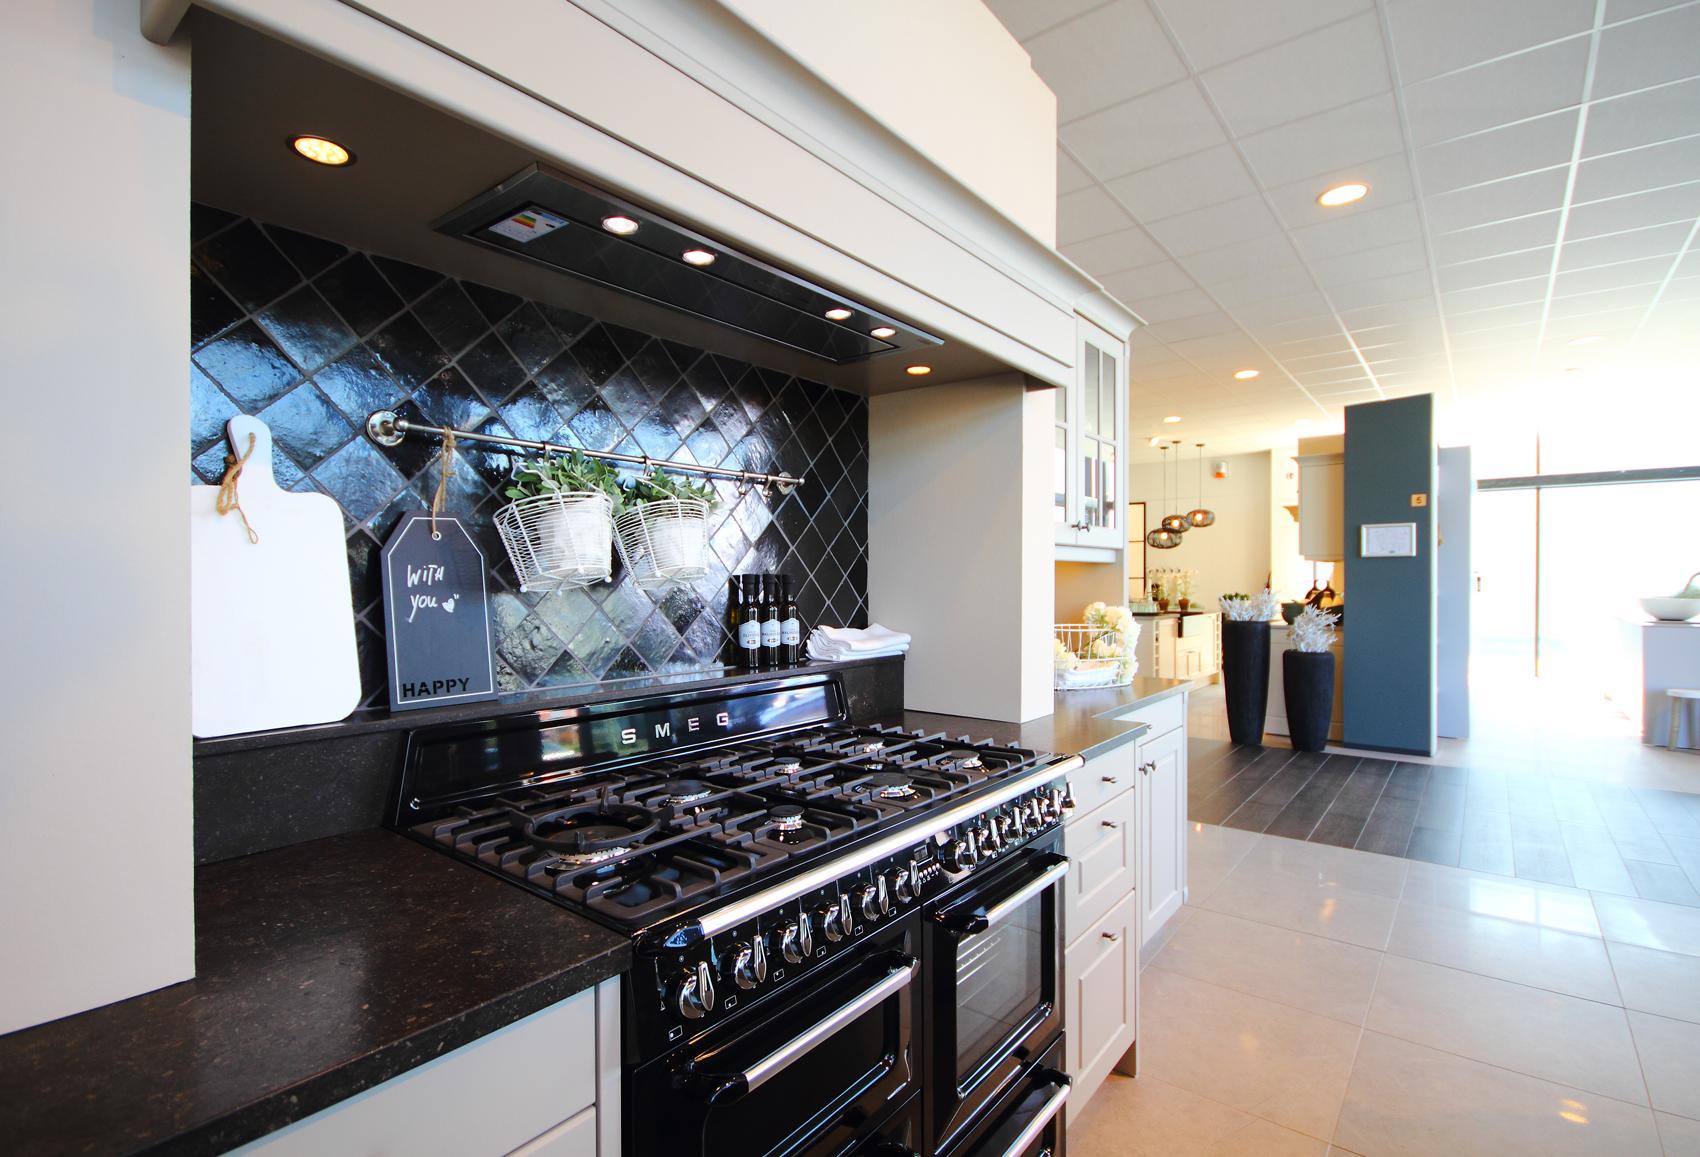 Dsm keukens roeselare openingsuren